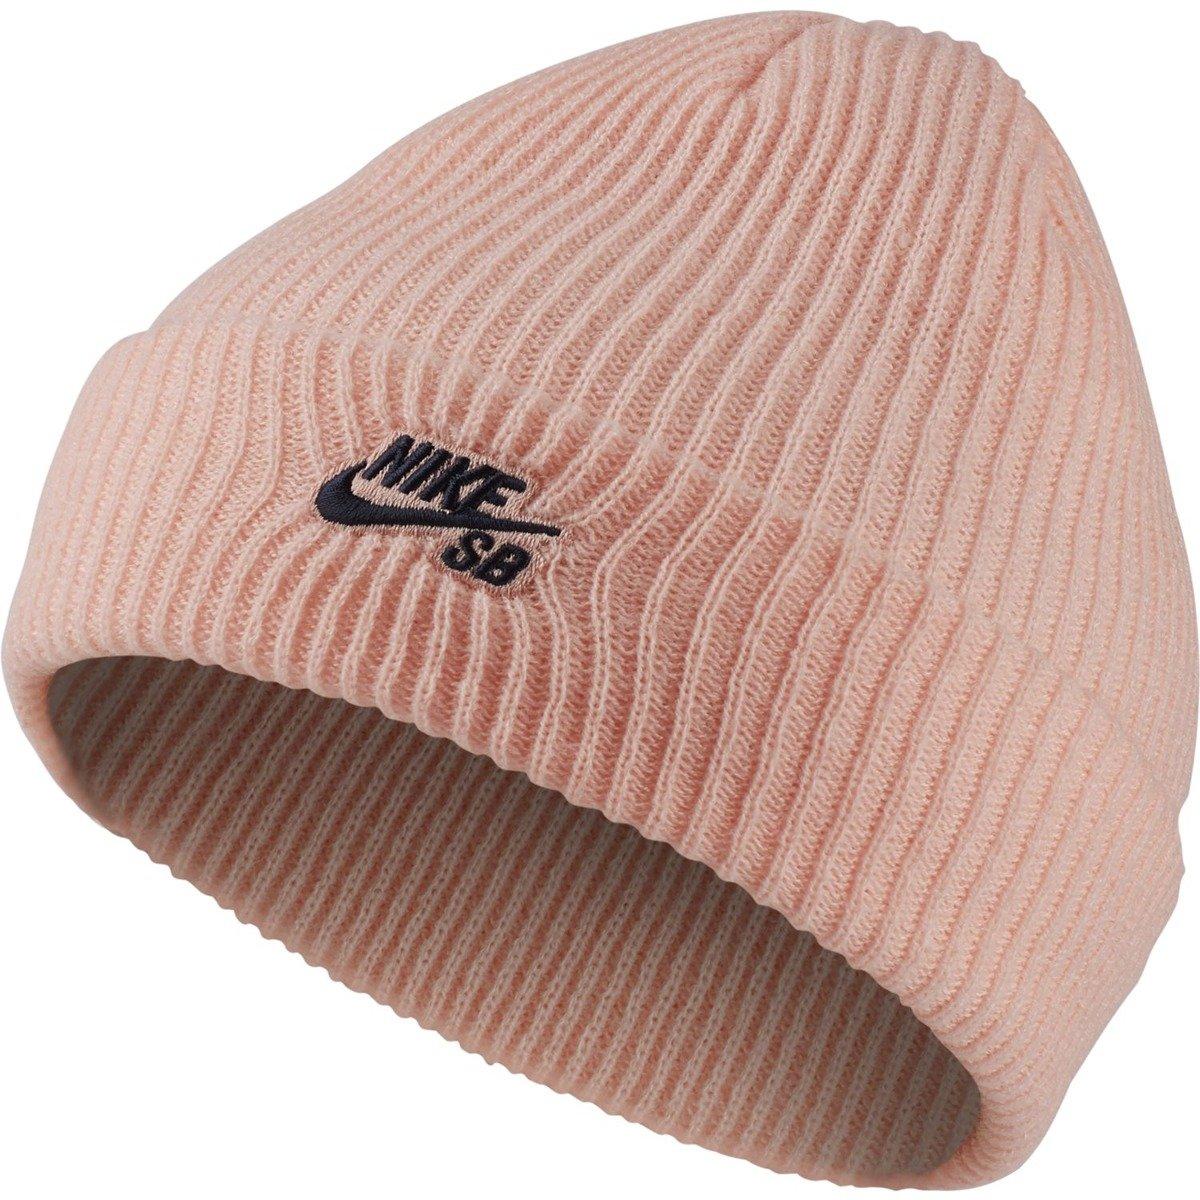 new concept 3eec1 beb54 nike sb fisherman beanie storm pink obsidian pink   Clothes   Cap   Beanie  Brands   Nike SB   Skateshop Miniramp.pl